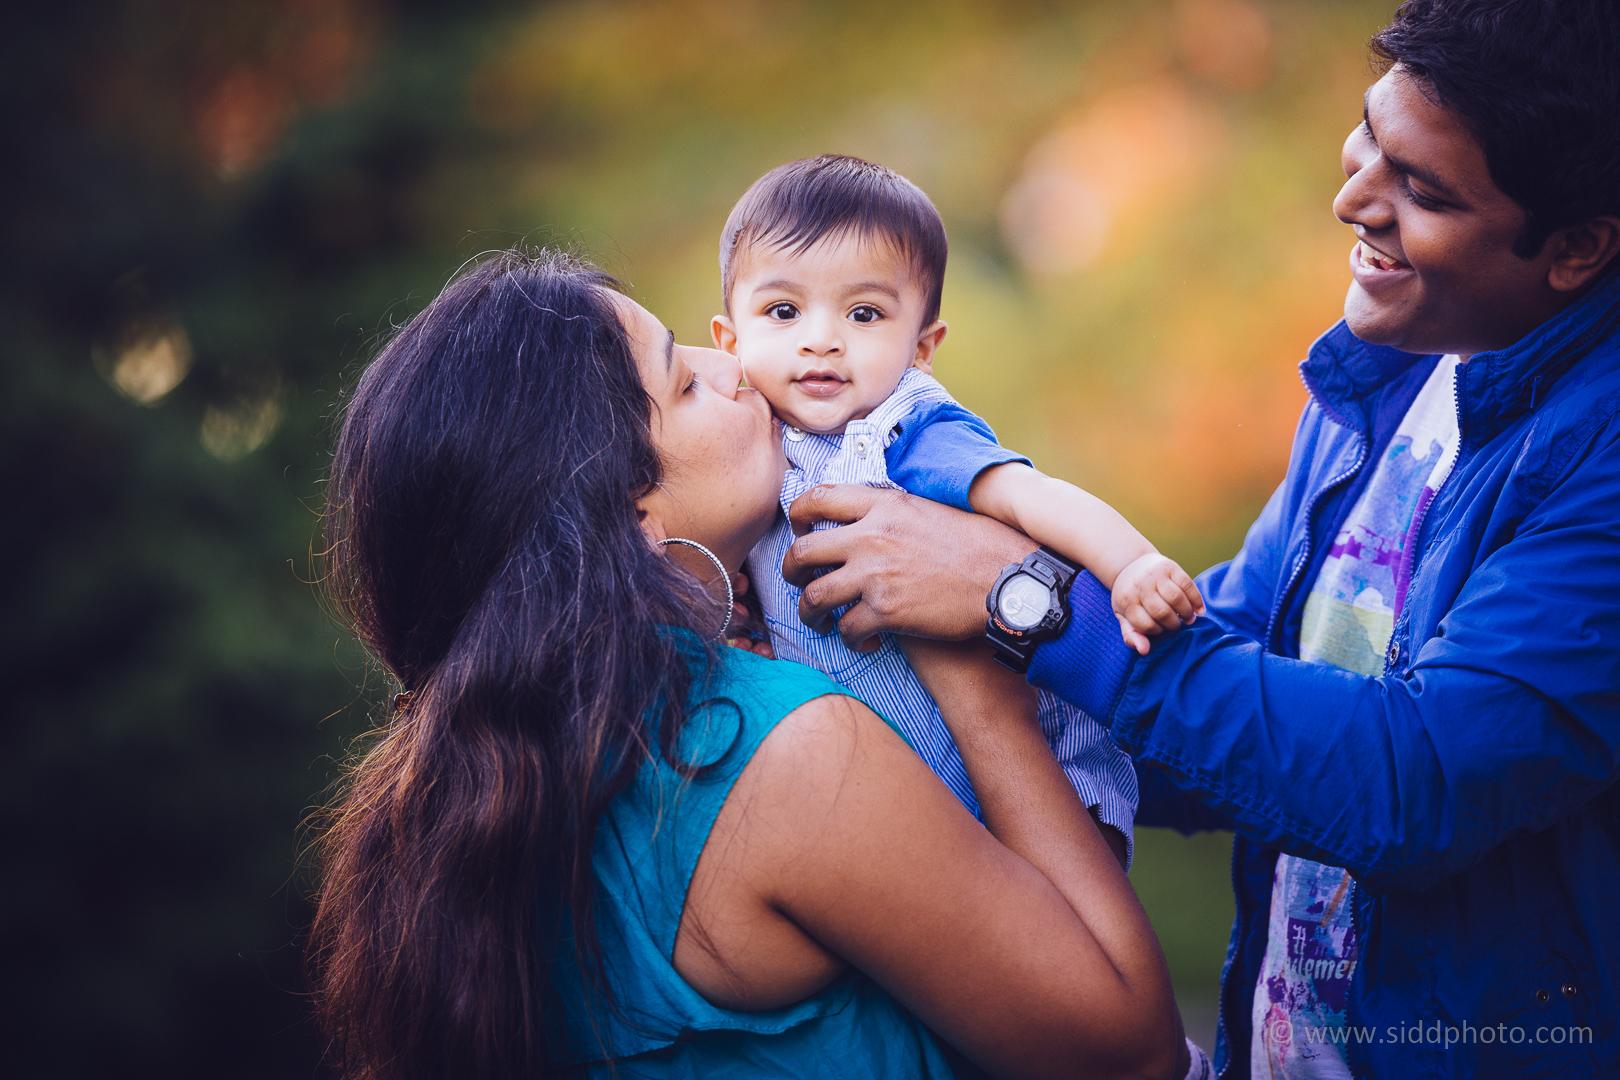 2014-10-18 - Deepthi Parthu Family - _O5C5995